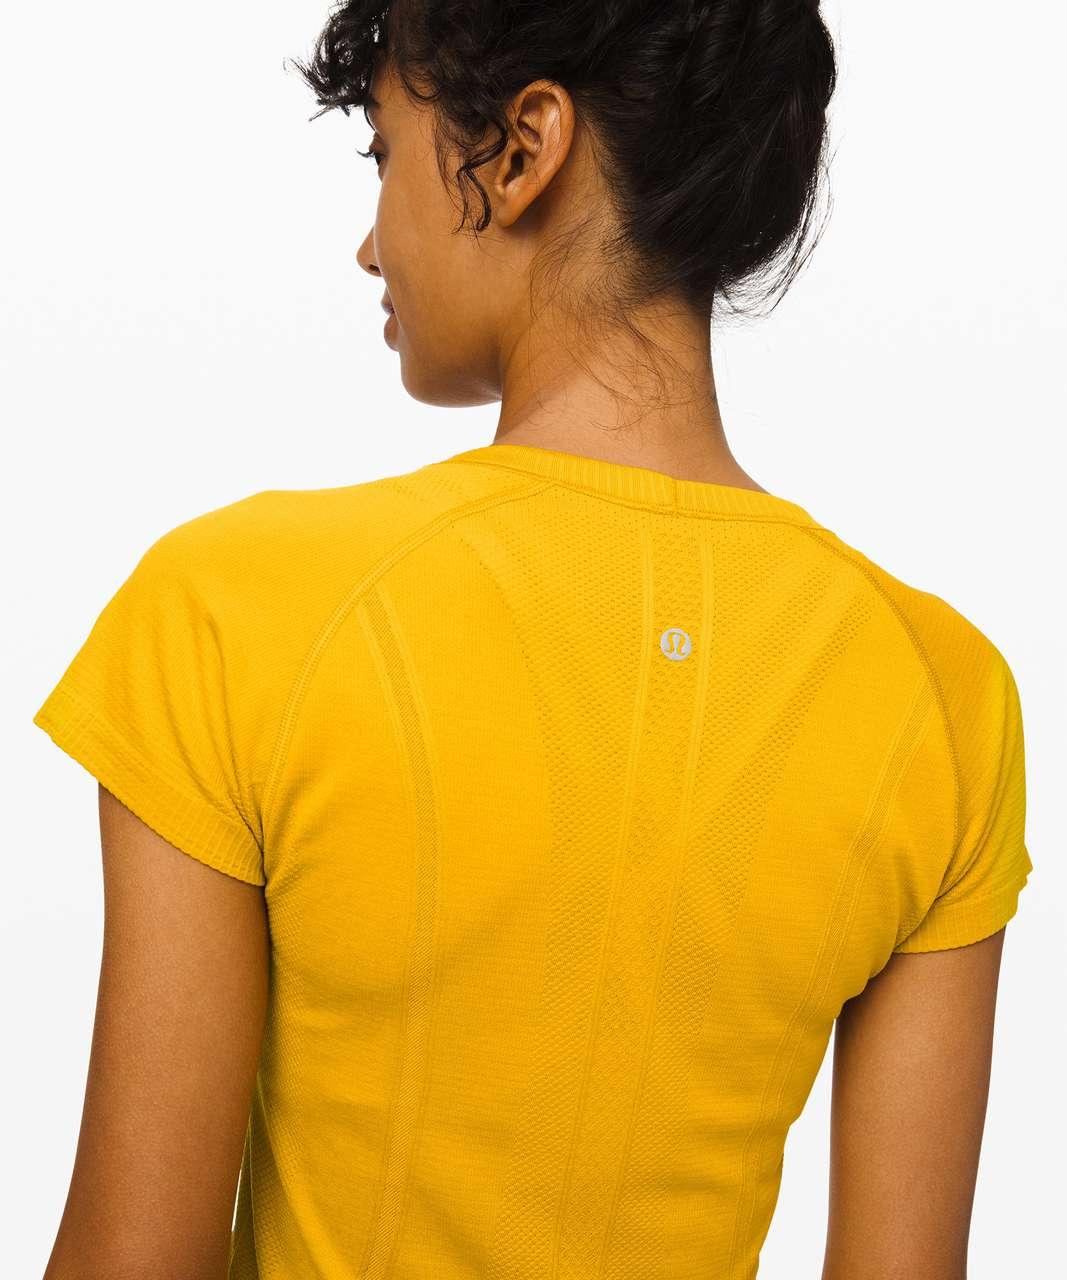 Lululemon Swiftly Tech Short Sleeve Crew - Honeycomb / Honeycomb